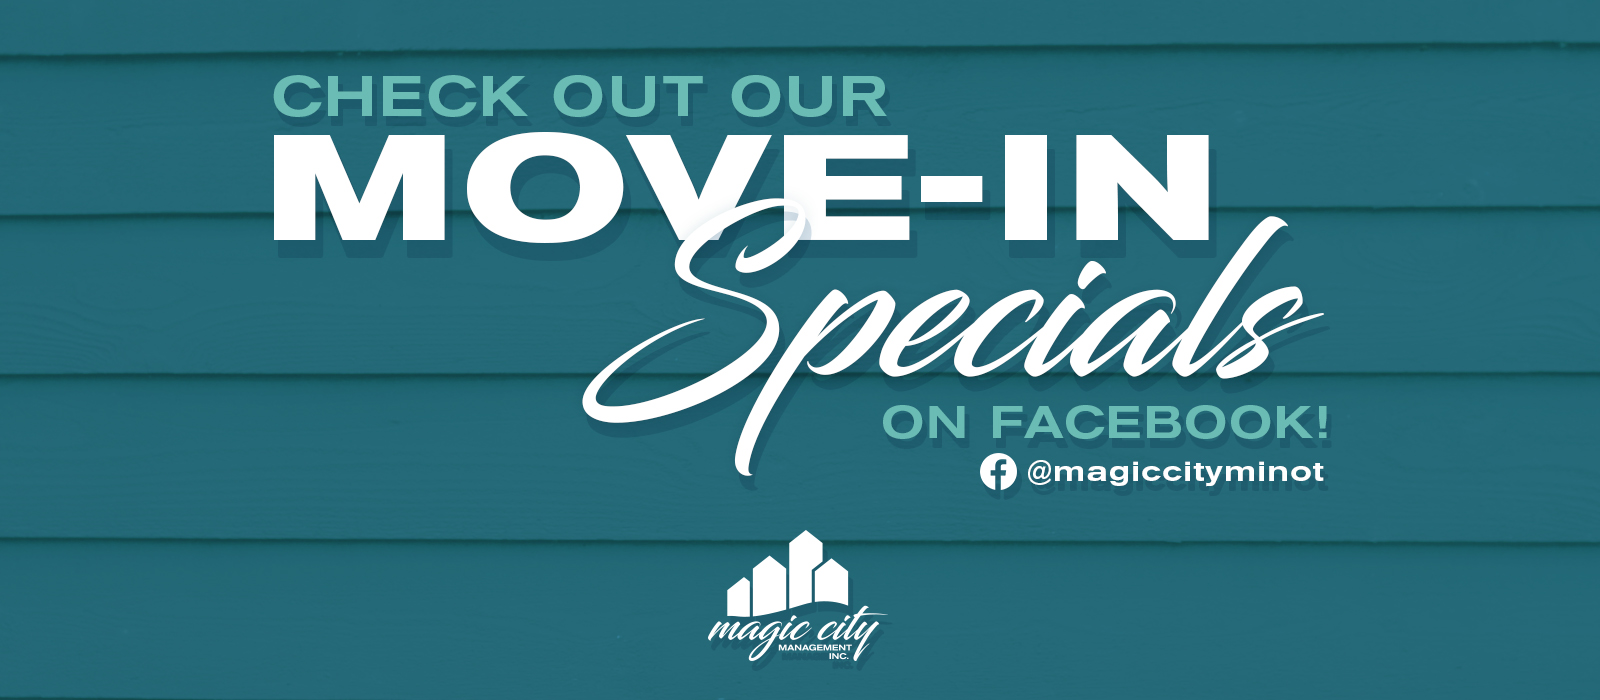 MoveInSpecial_FacebookTag_VideoSlider-MagicCityManagement